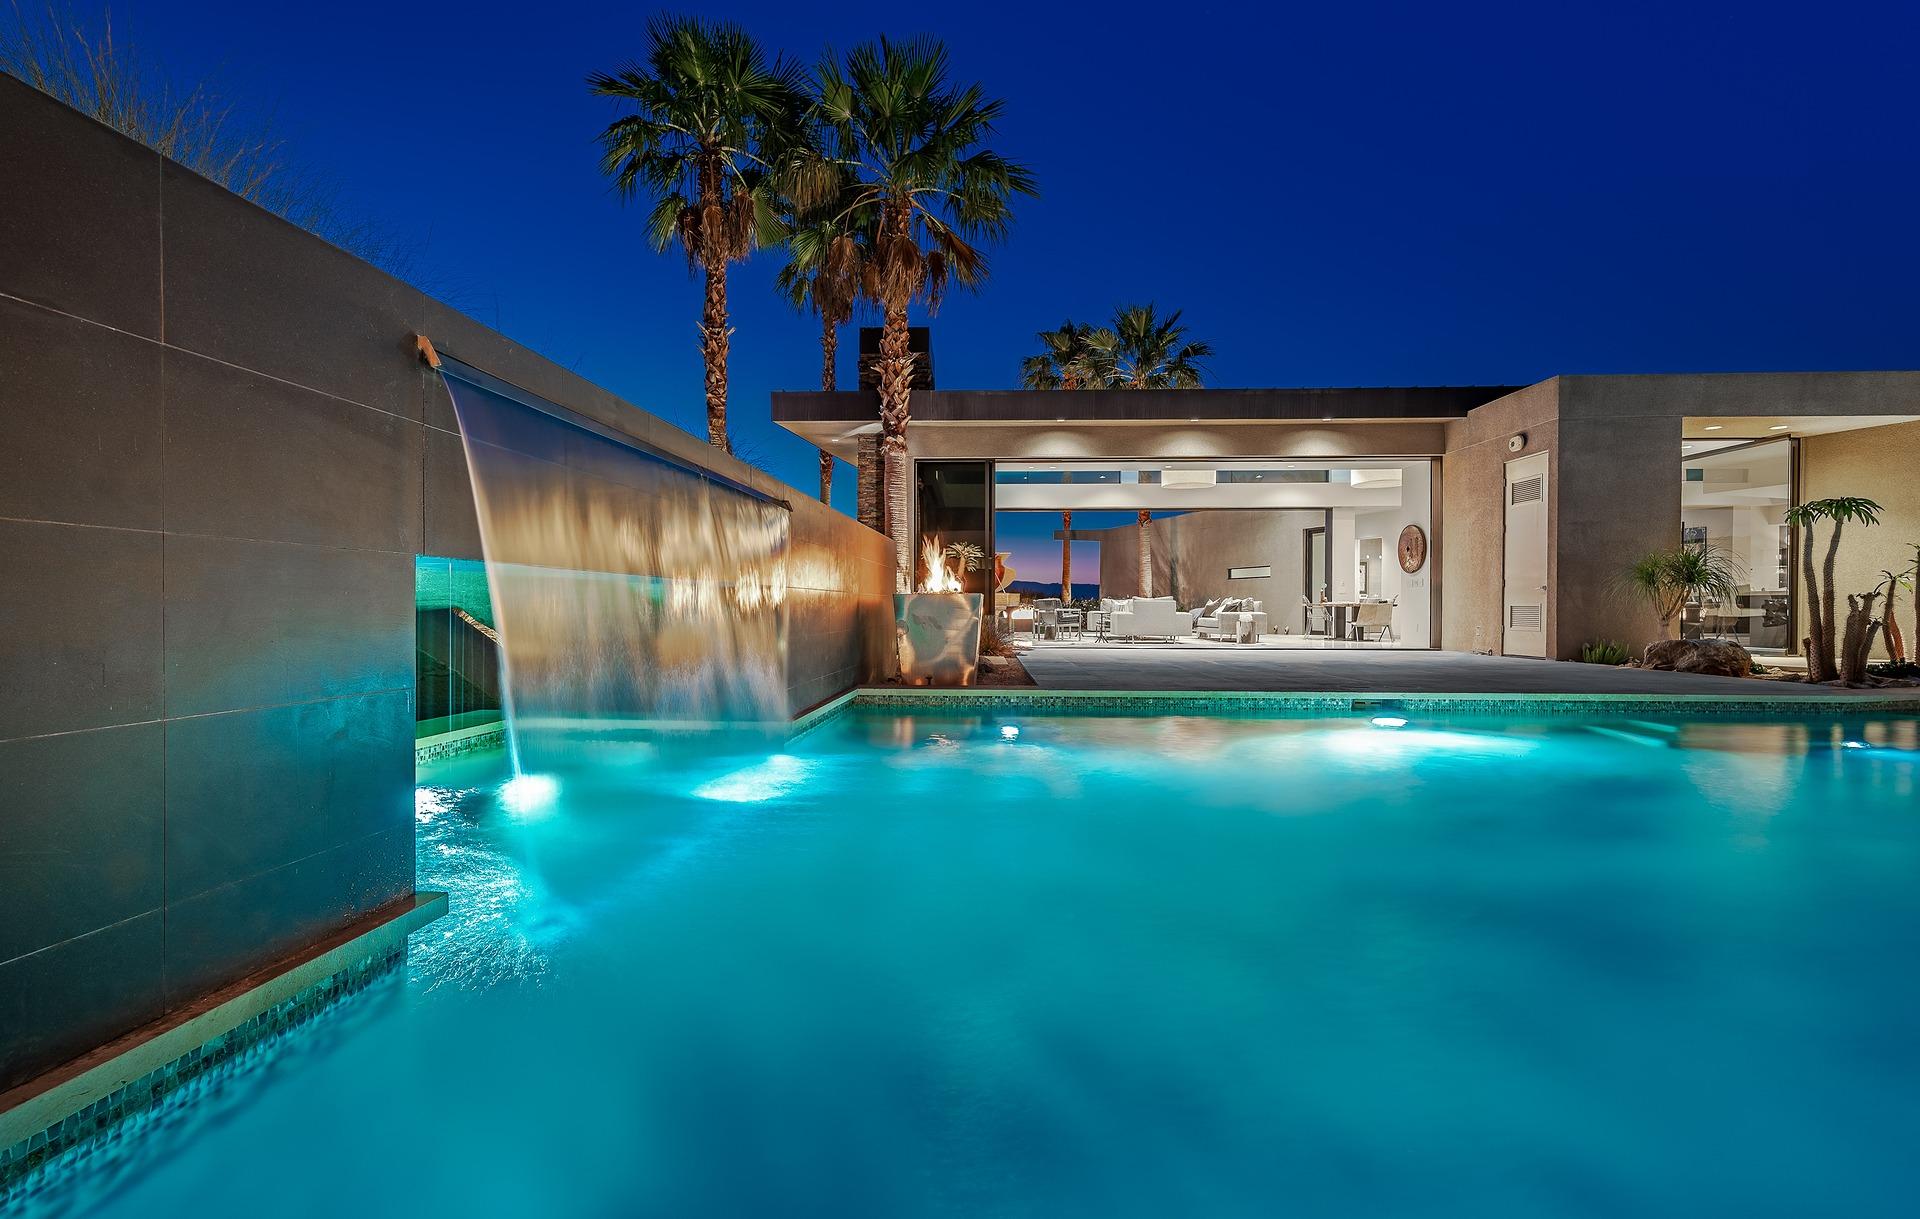 7 Rockcrest | Rancho Mirage | $3,988,888